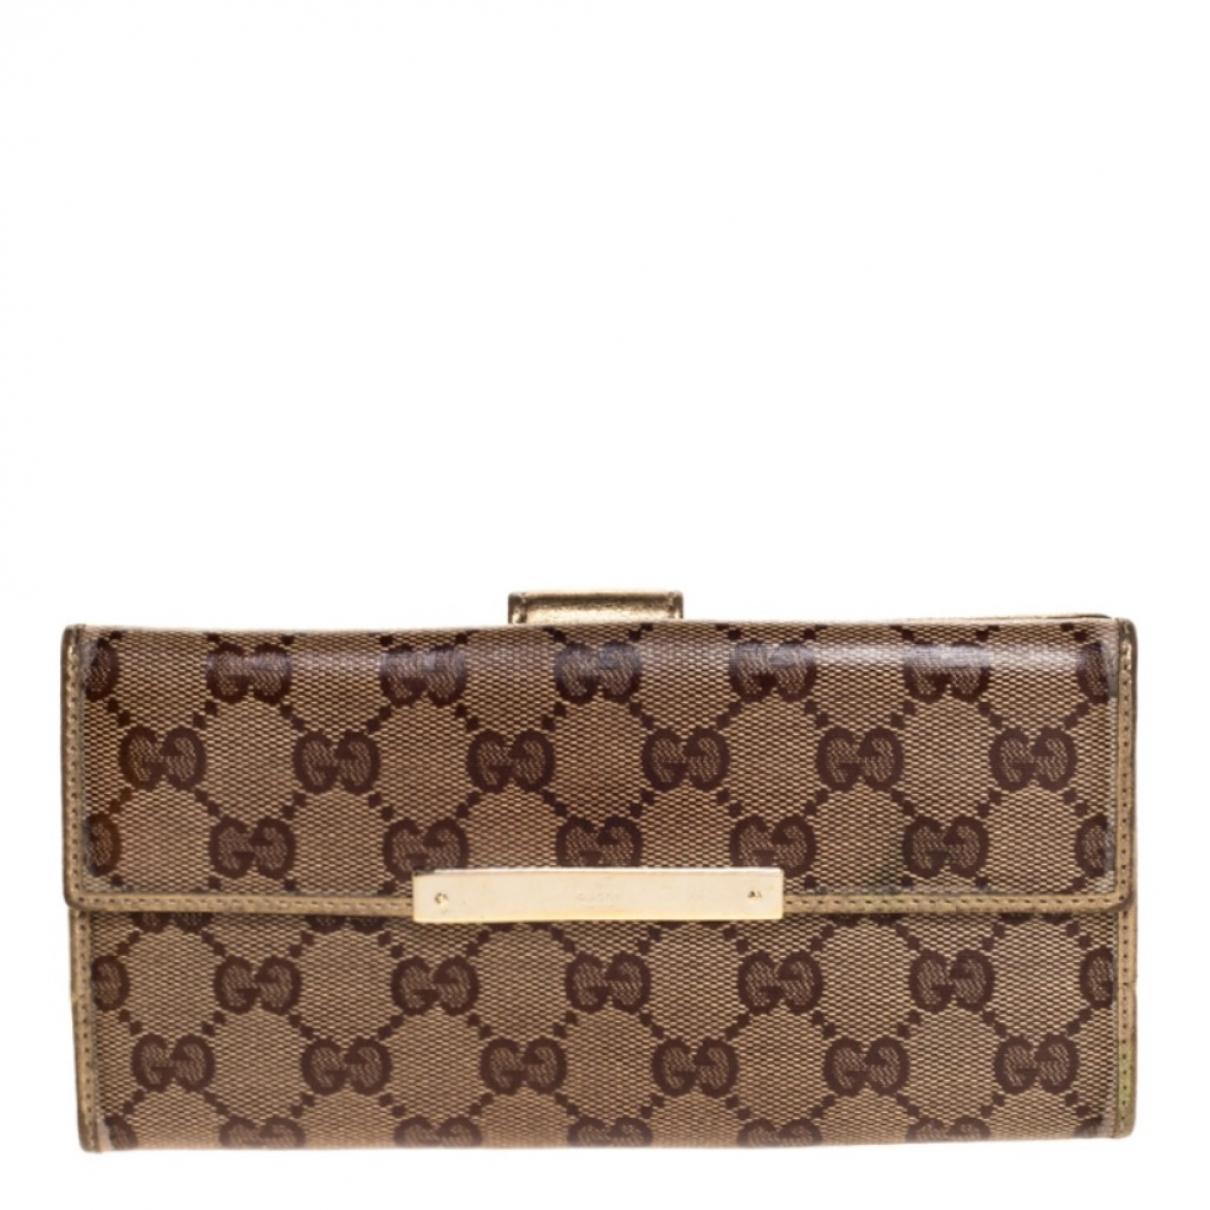 Gucci N Beige Leather wallet for Women N